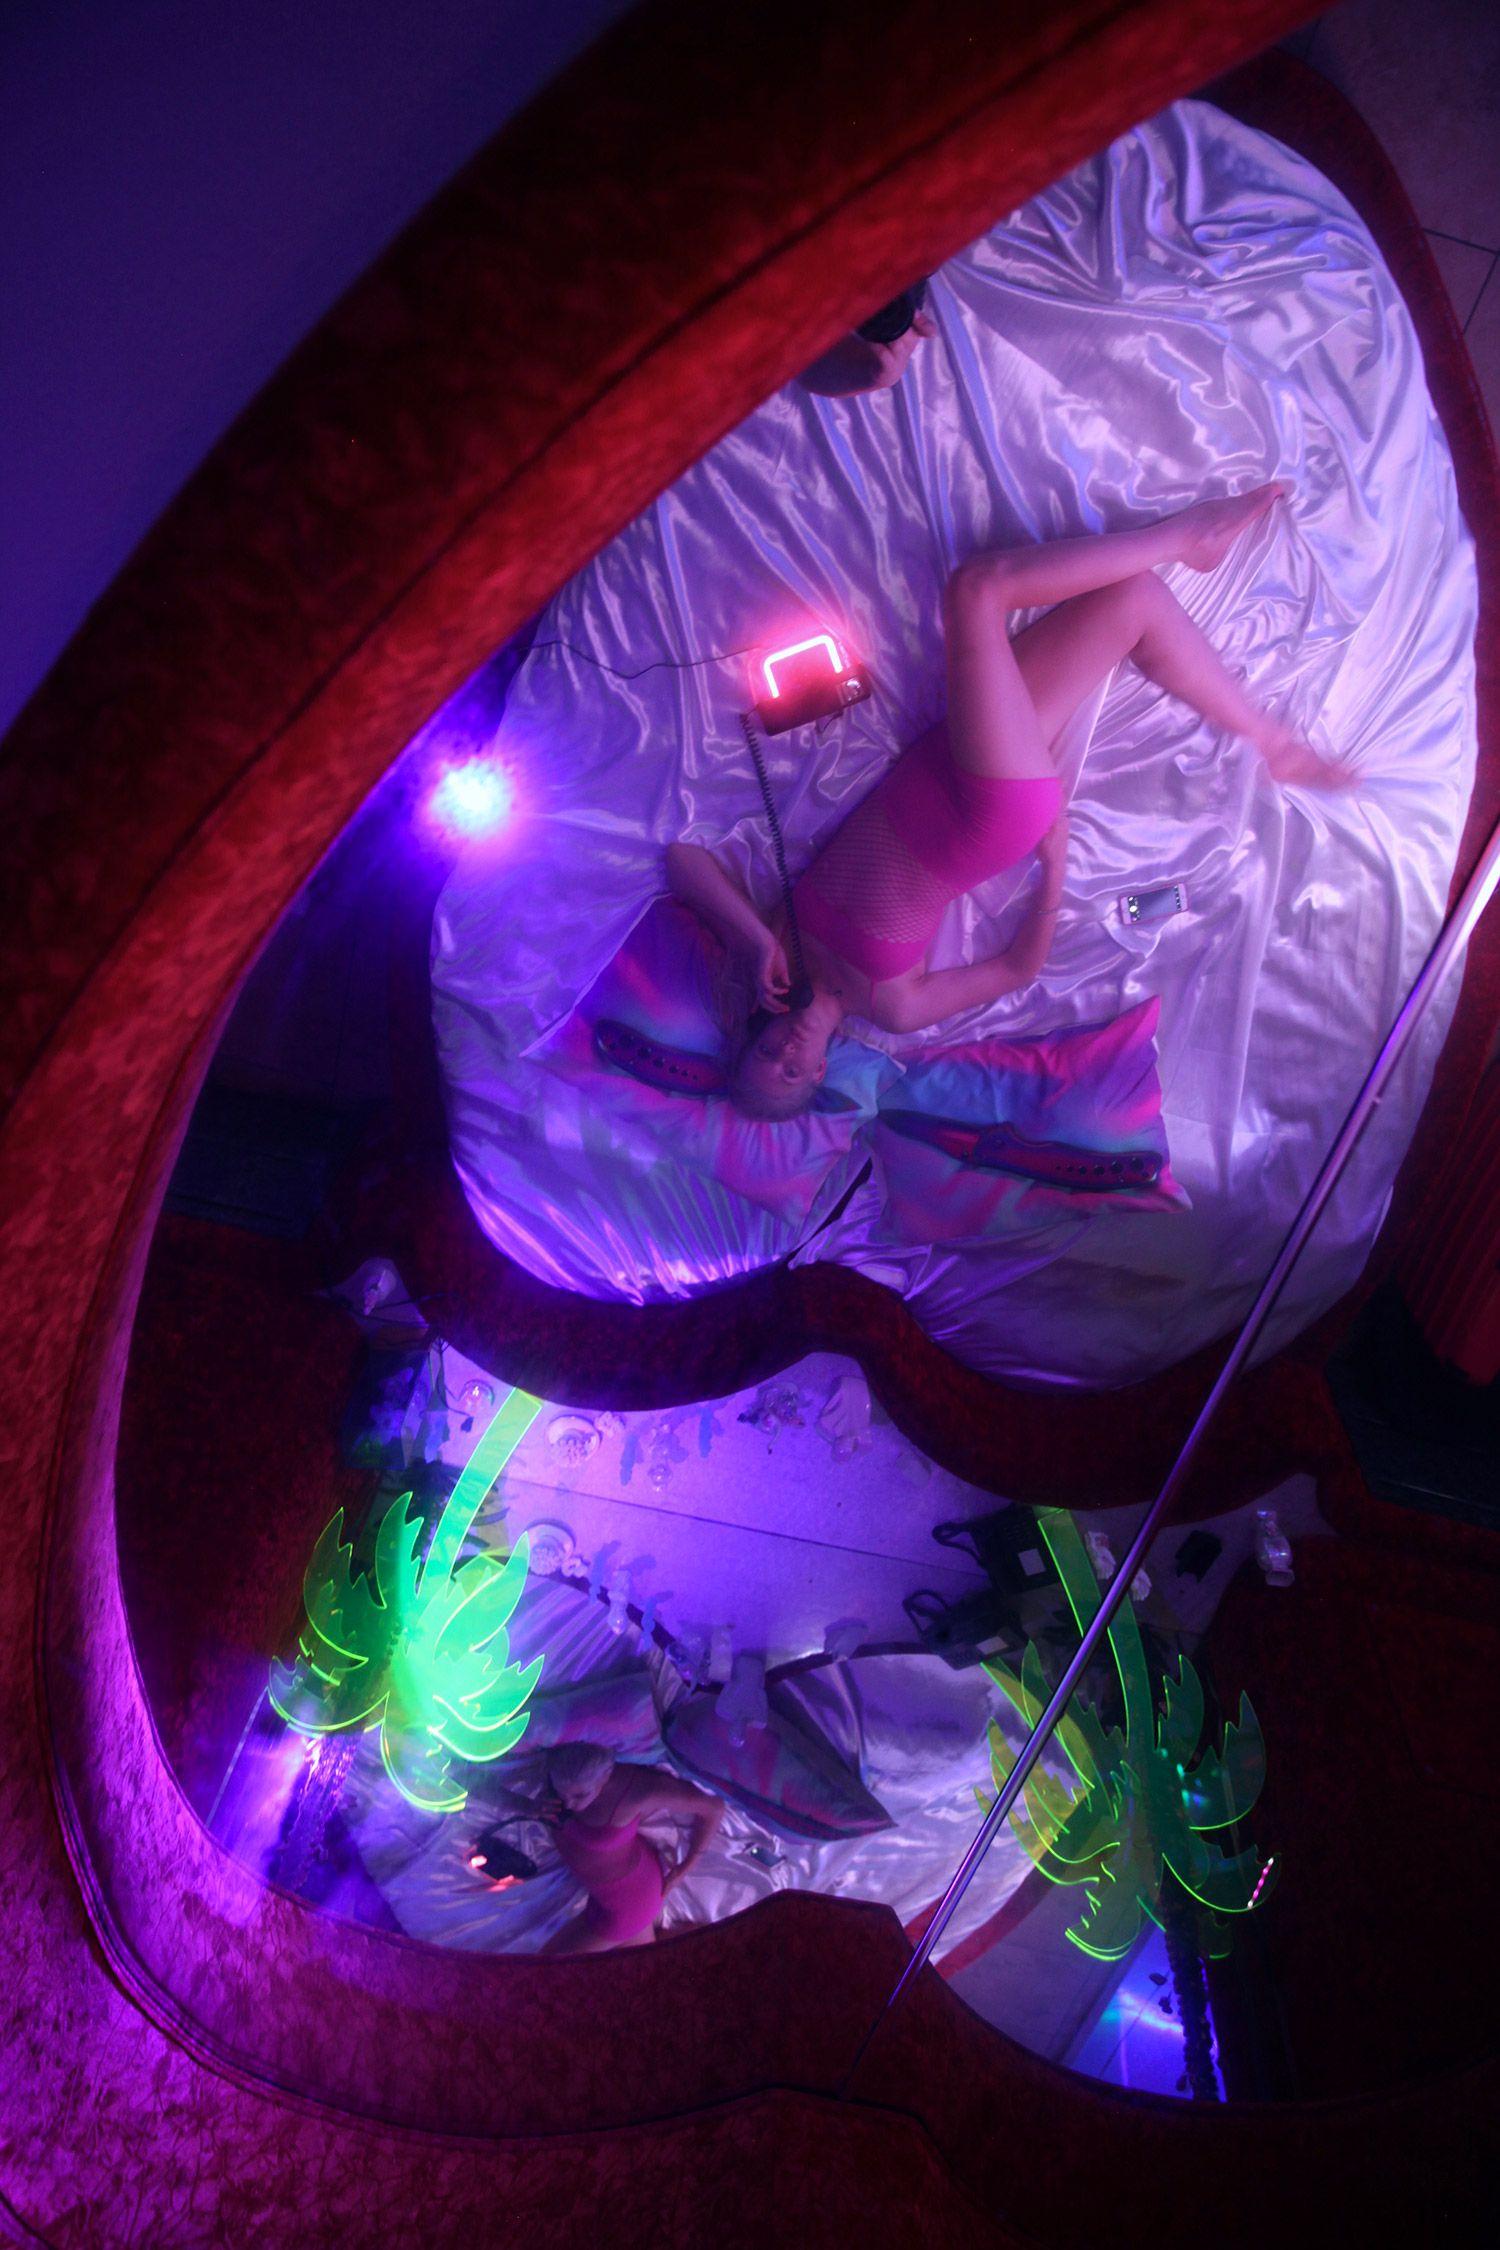 Motelscape A Surreal Full Room Critique Of Fantasy And Commodified Desires Surrealism Retro Futurism Magazine Art